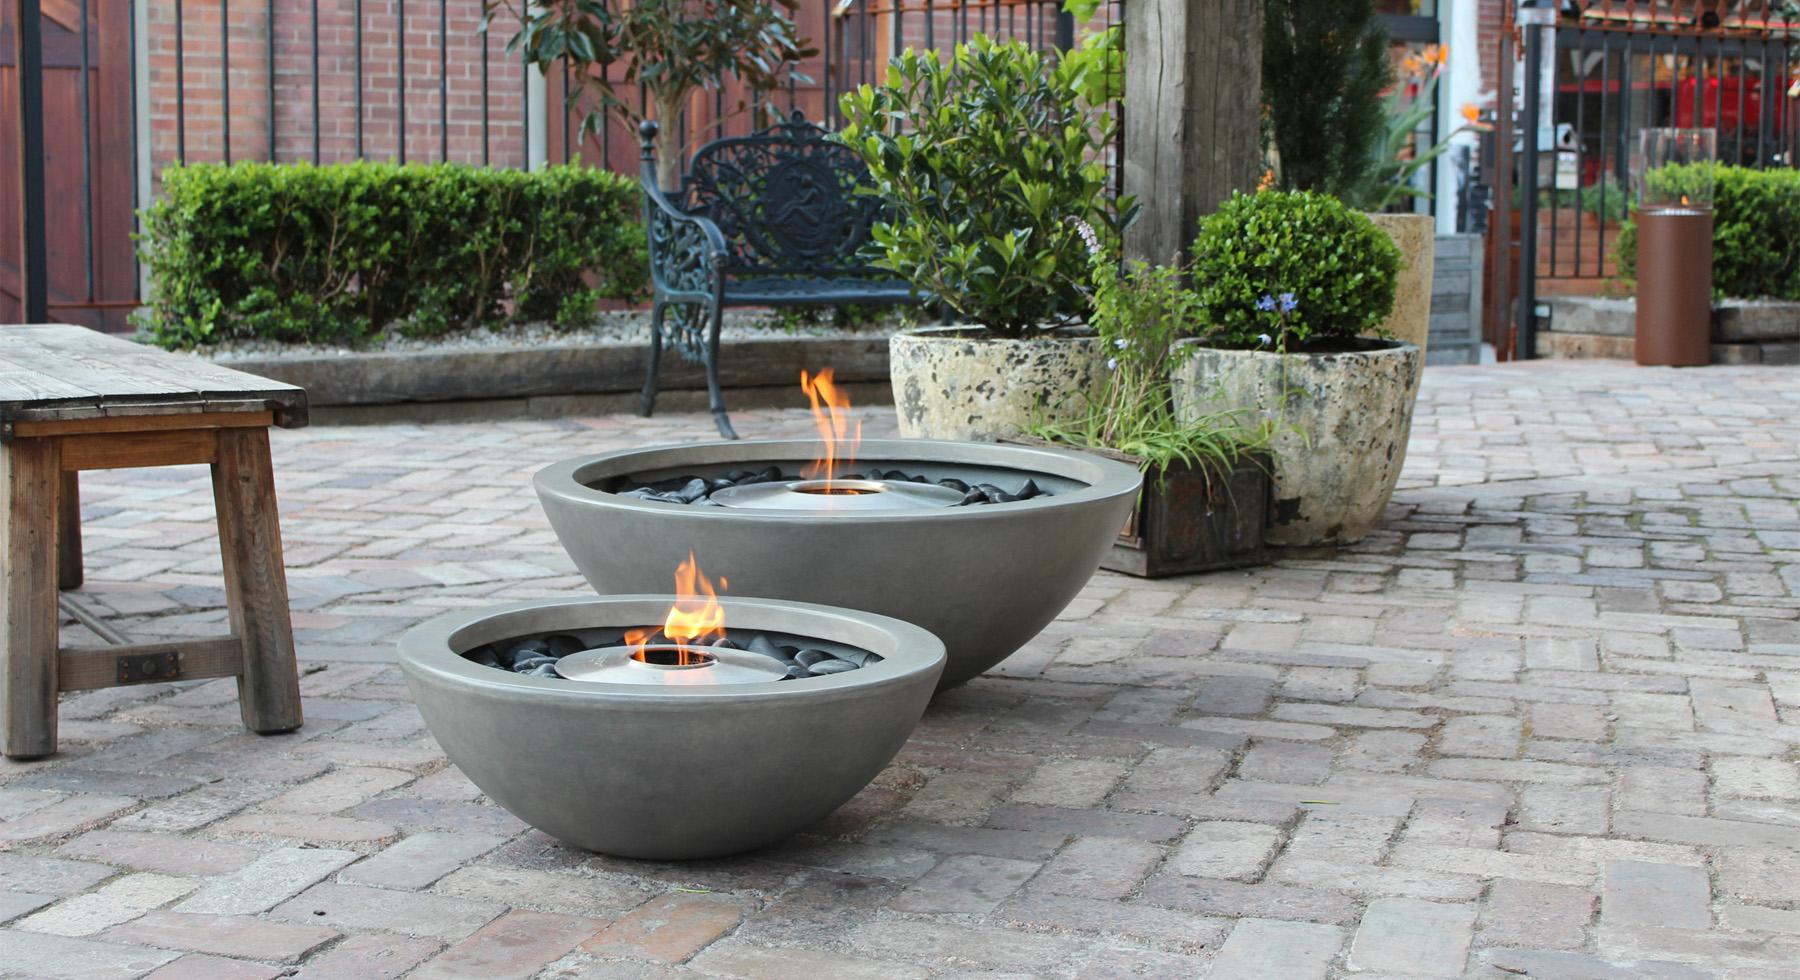 Cheminée bioéthanol Ecosmart Fire MIX